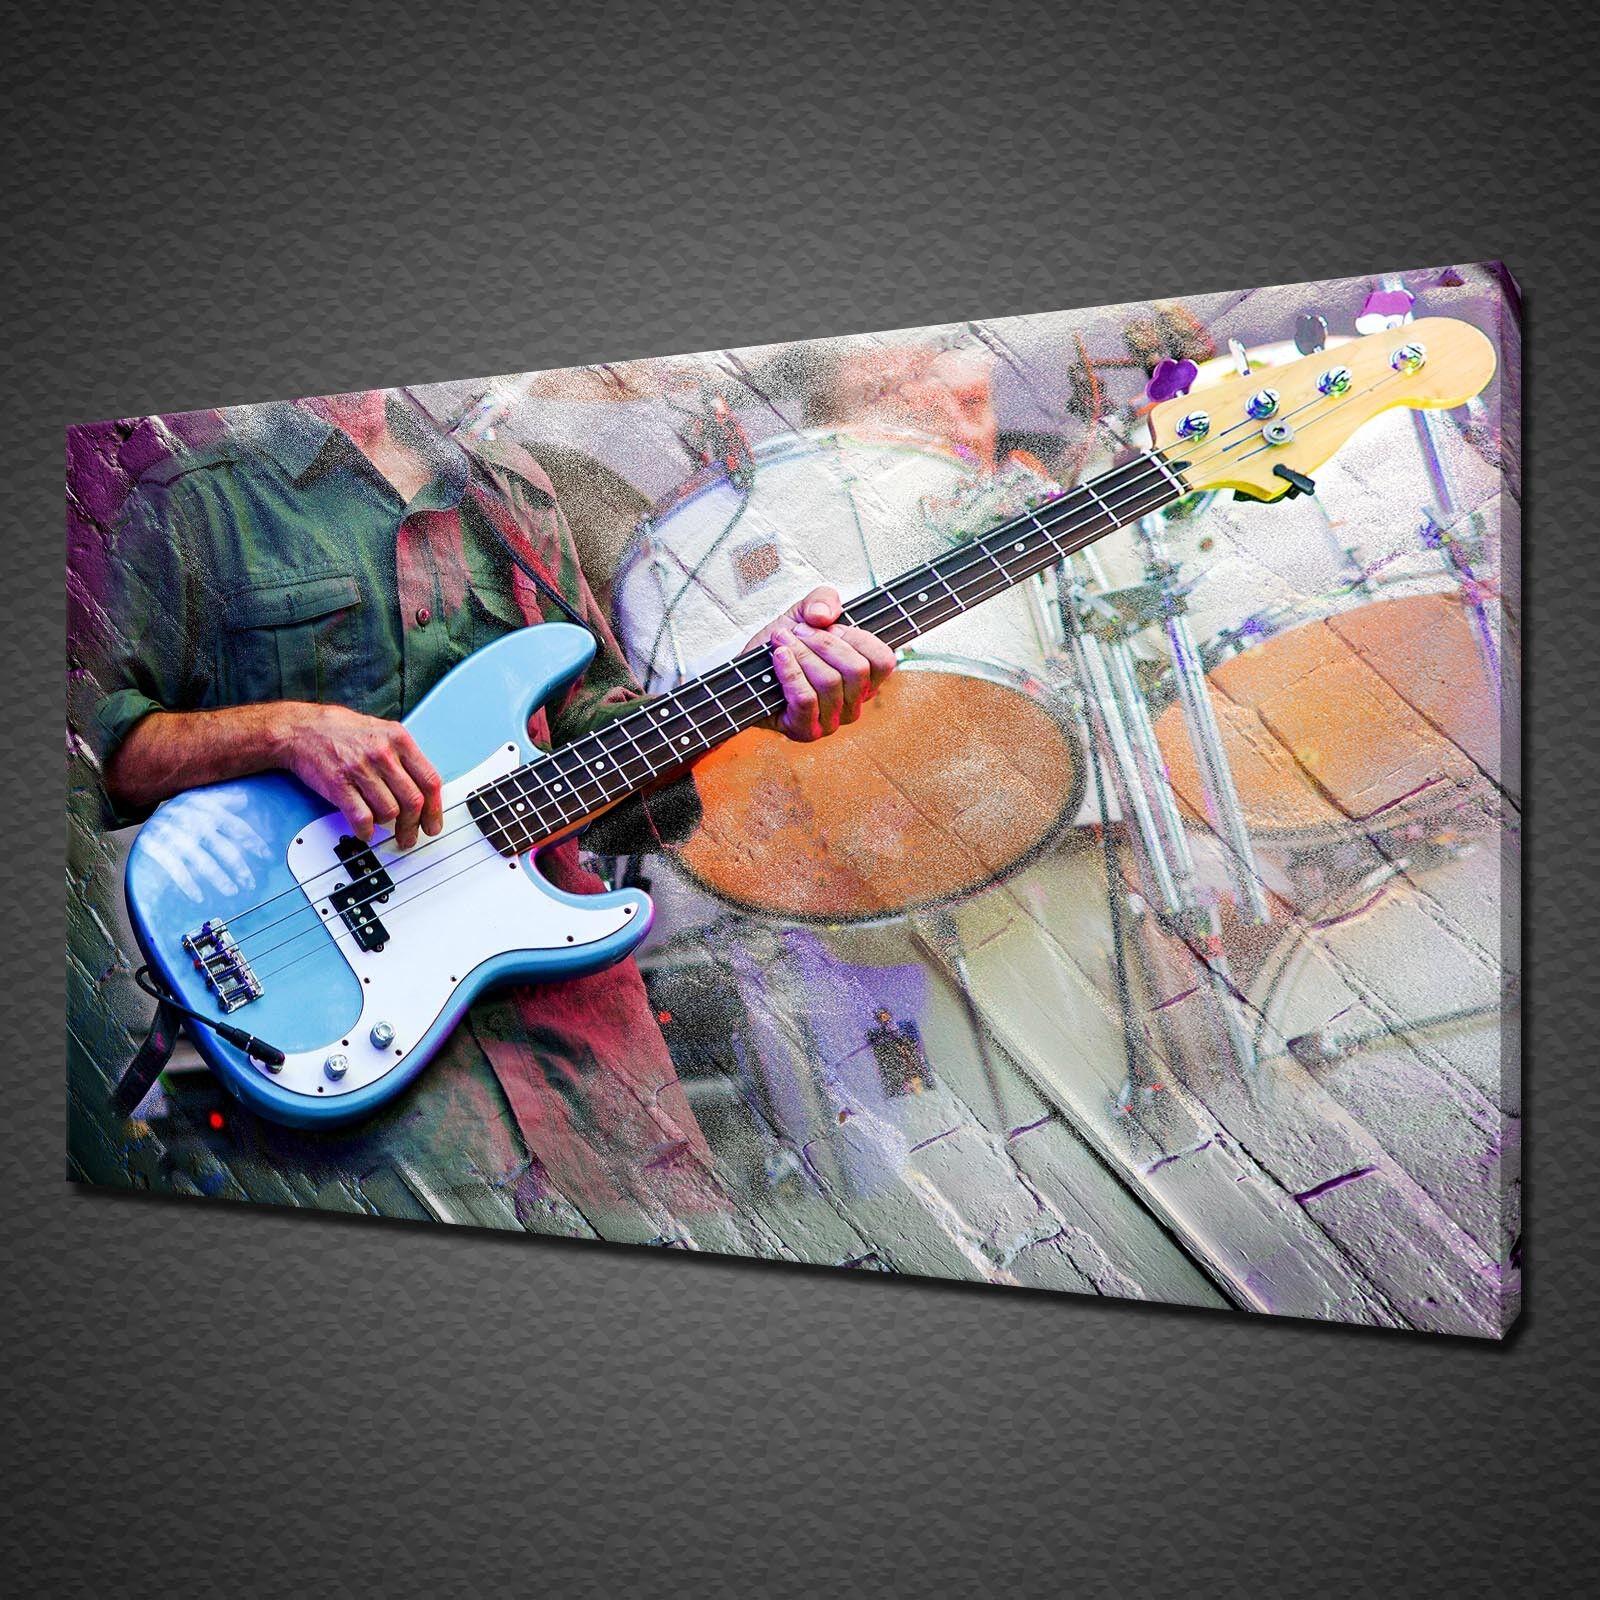 GUITAR DRUMS MUSICIANS CANVAS PICTURE PRINT WALL ART MODERN DESIGN